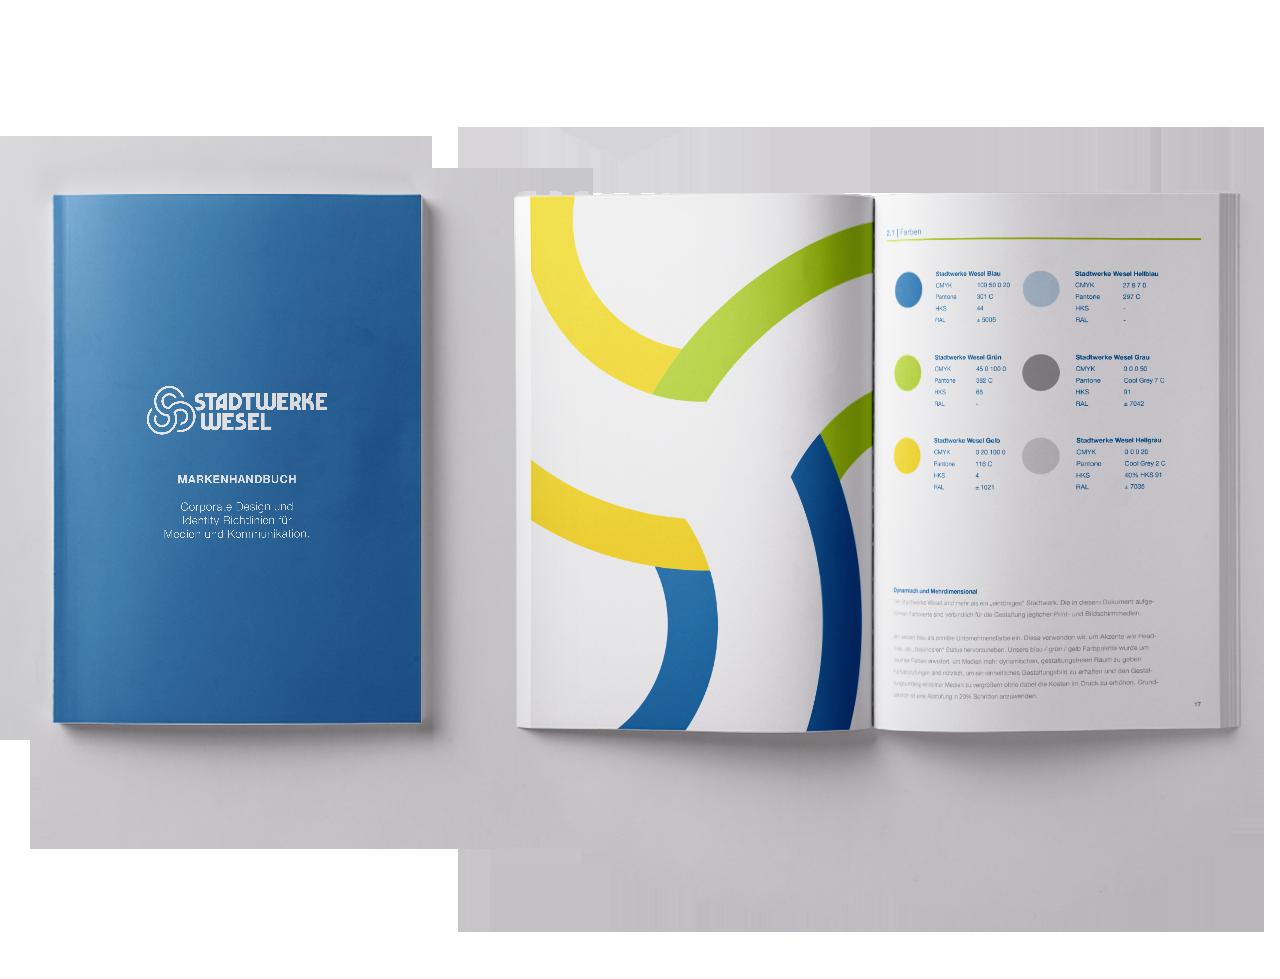 Stadtwerke Wesel corporate branding Markenhandbuch